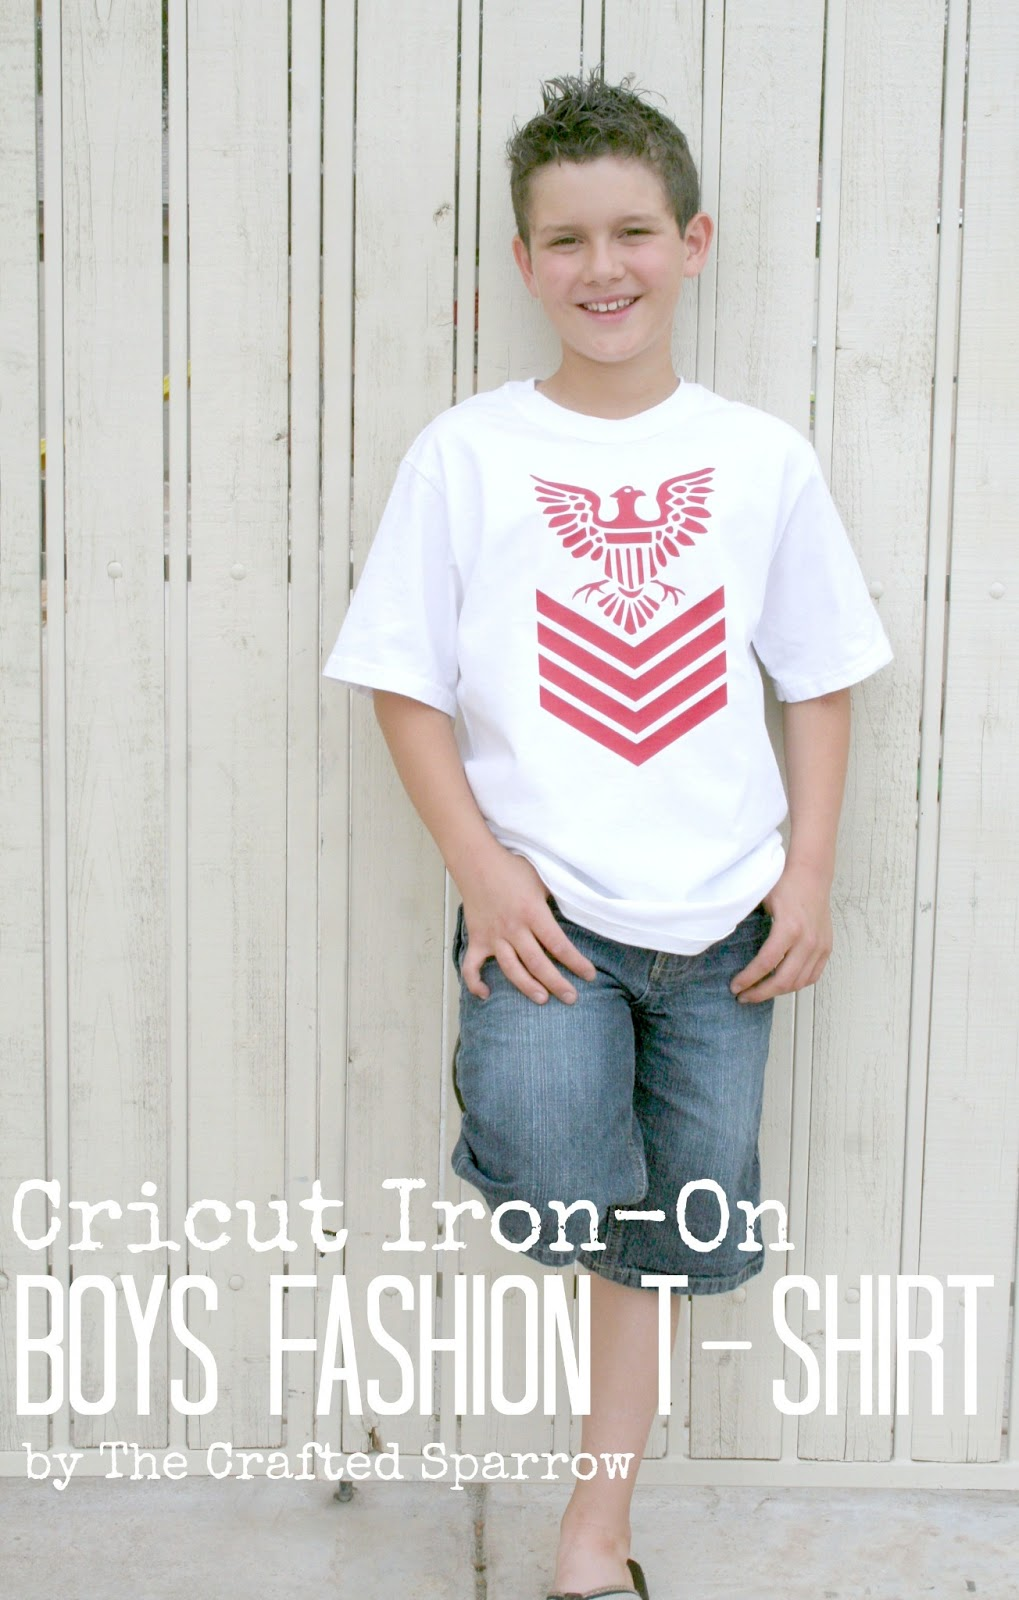 Cricut Iron-on Boys Fashion T-Shirt - The Crafted Sparrow